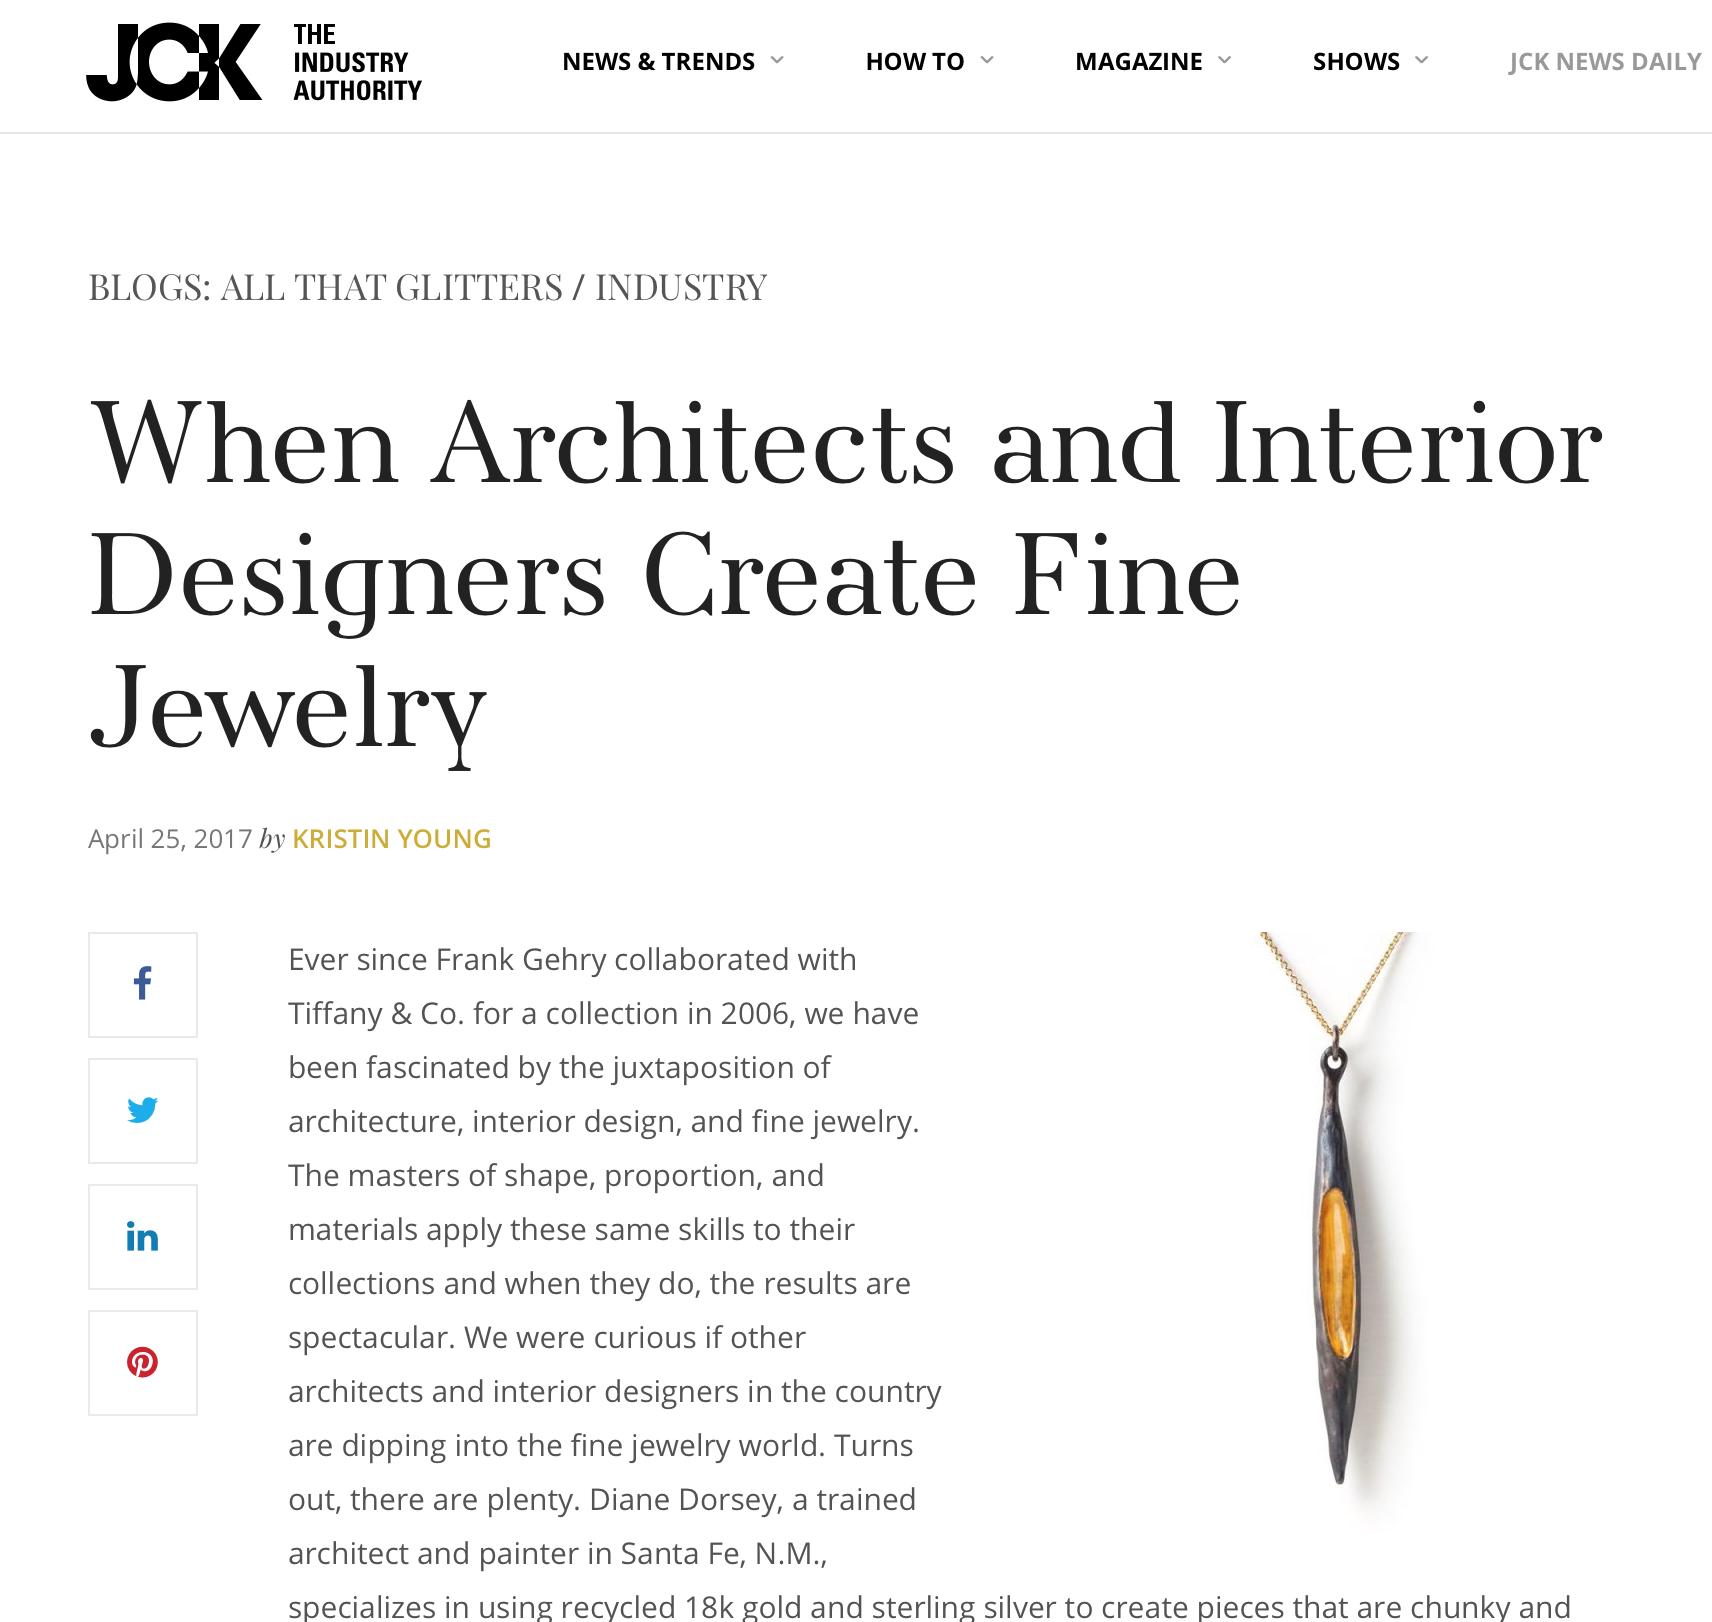 JCK Online